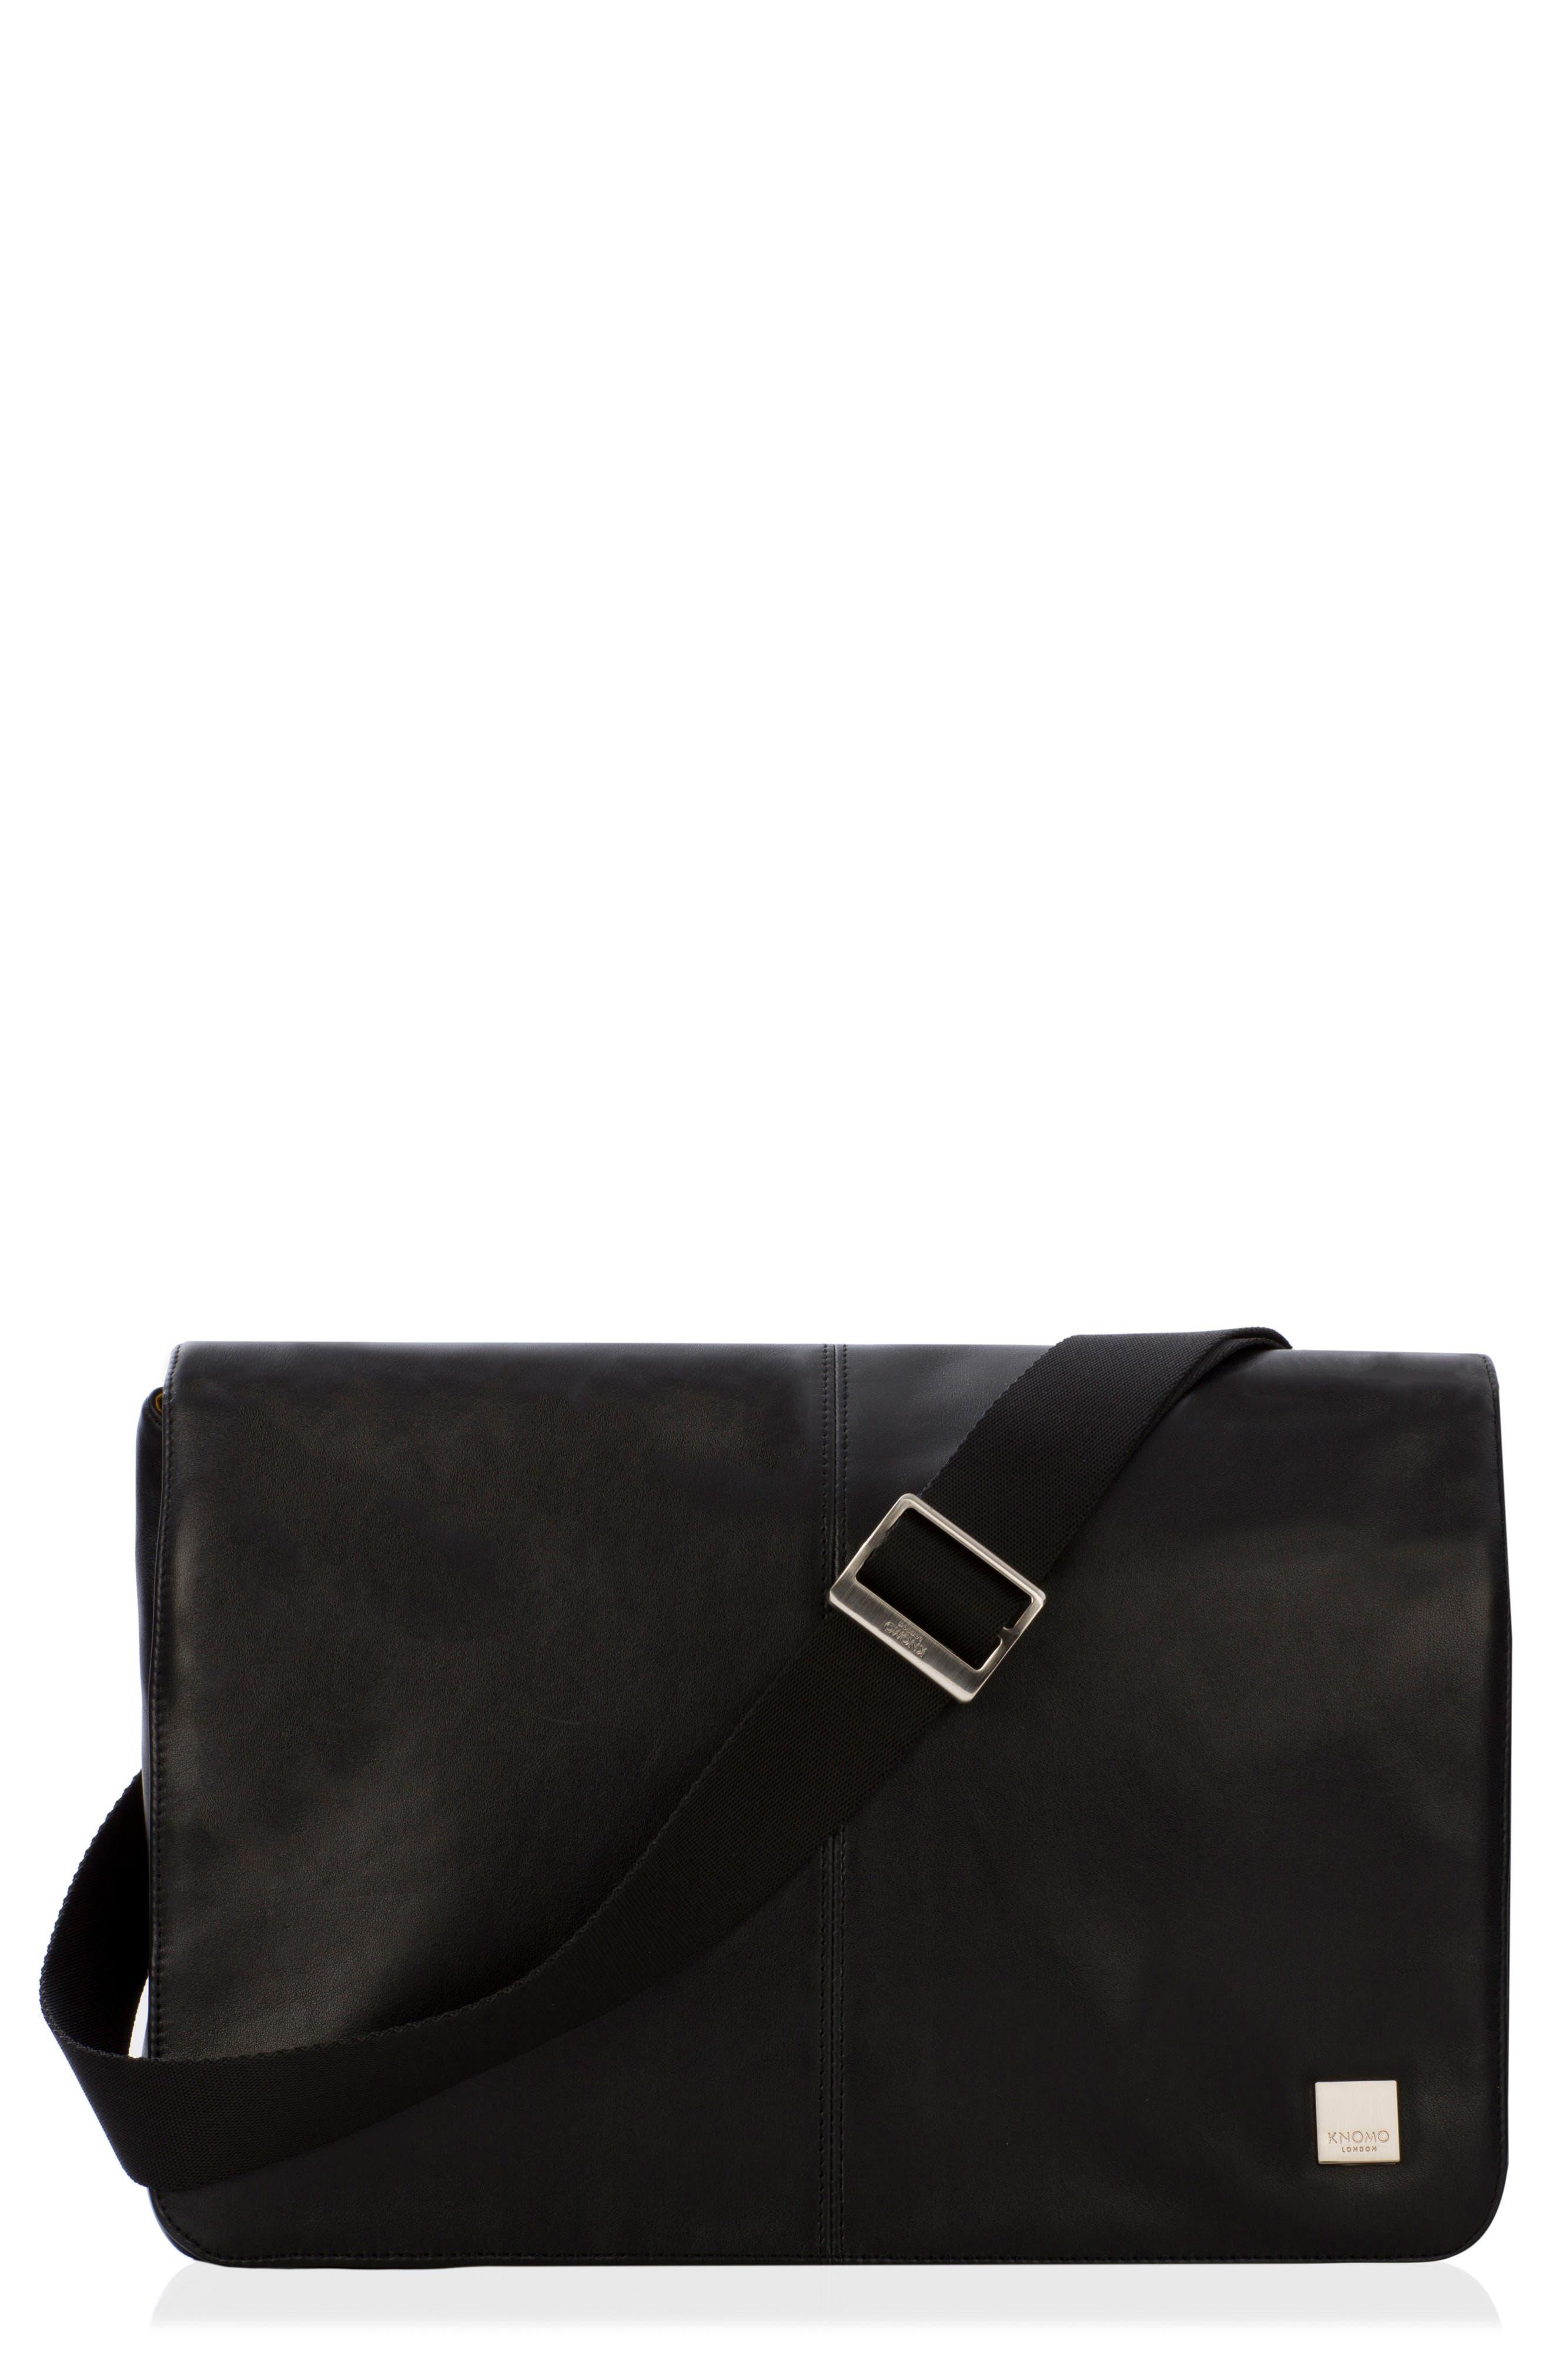 Brompton Kinsale RFID Leather Messenger Bag,                         Main,                         color, 001